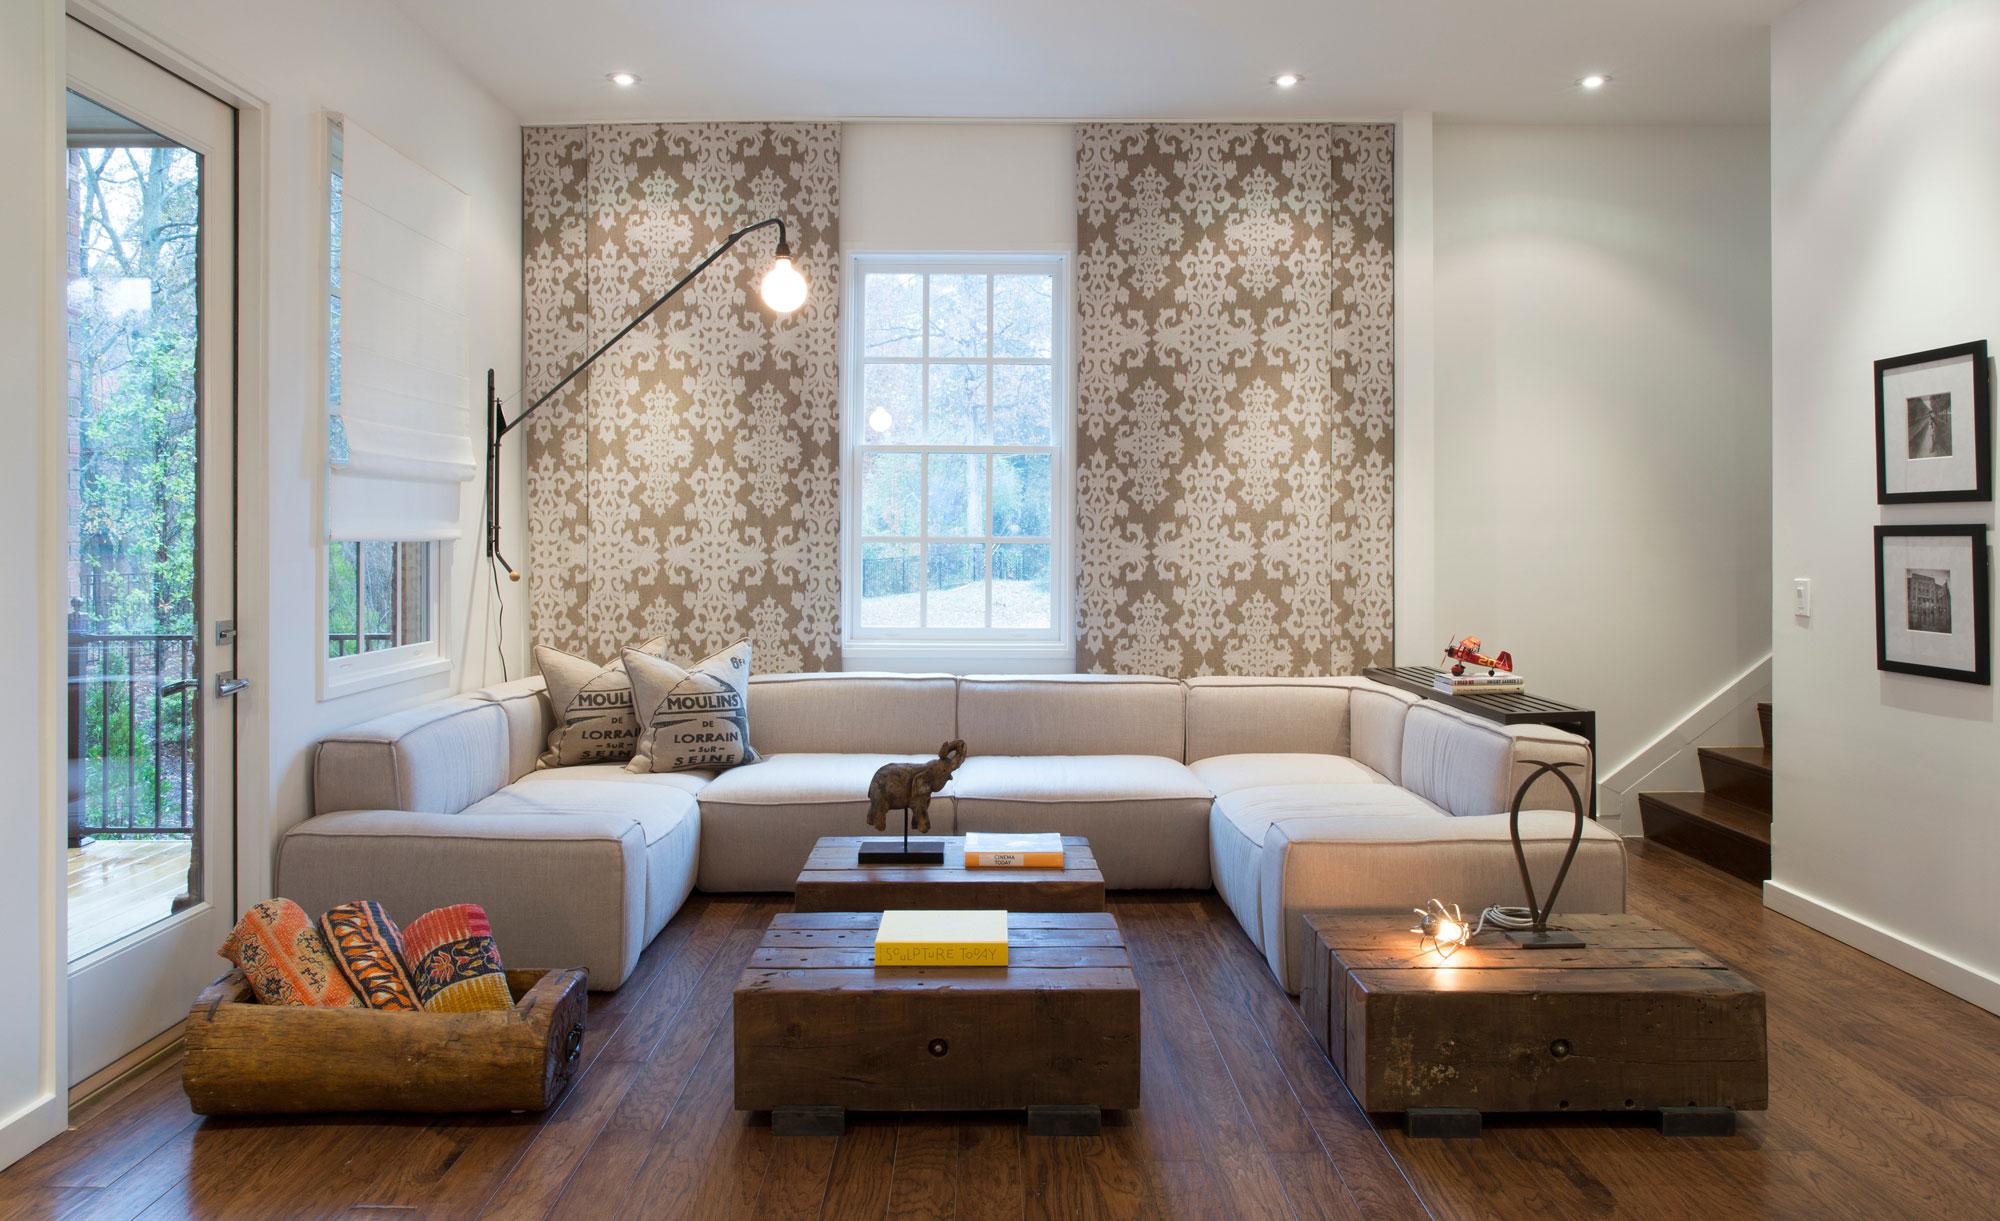 Chic Oglethorpe Home in Atlanta by Cecconi Simone-01